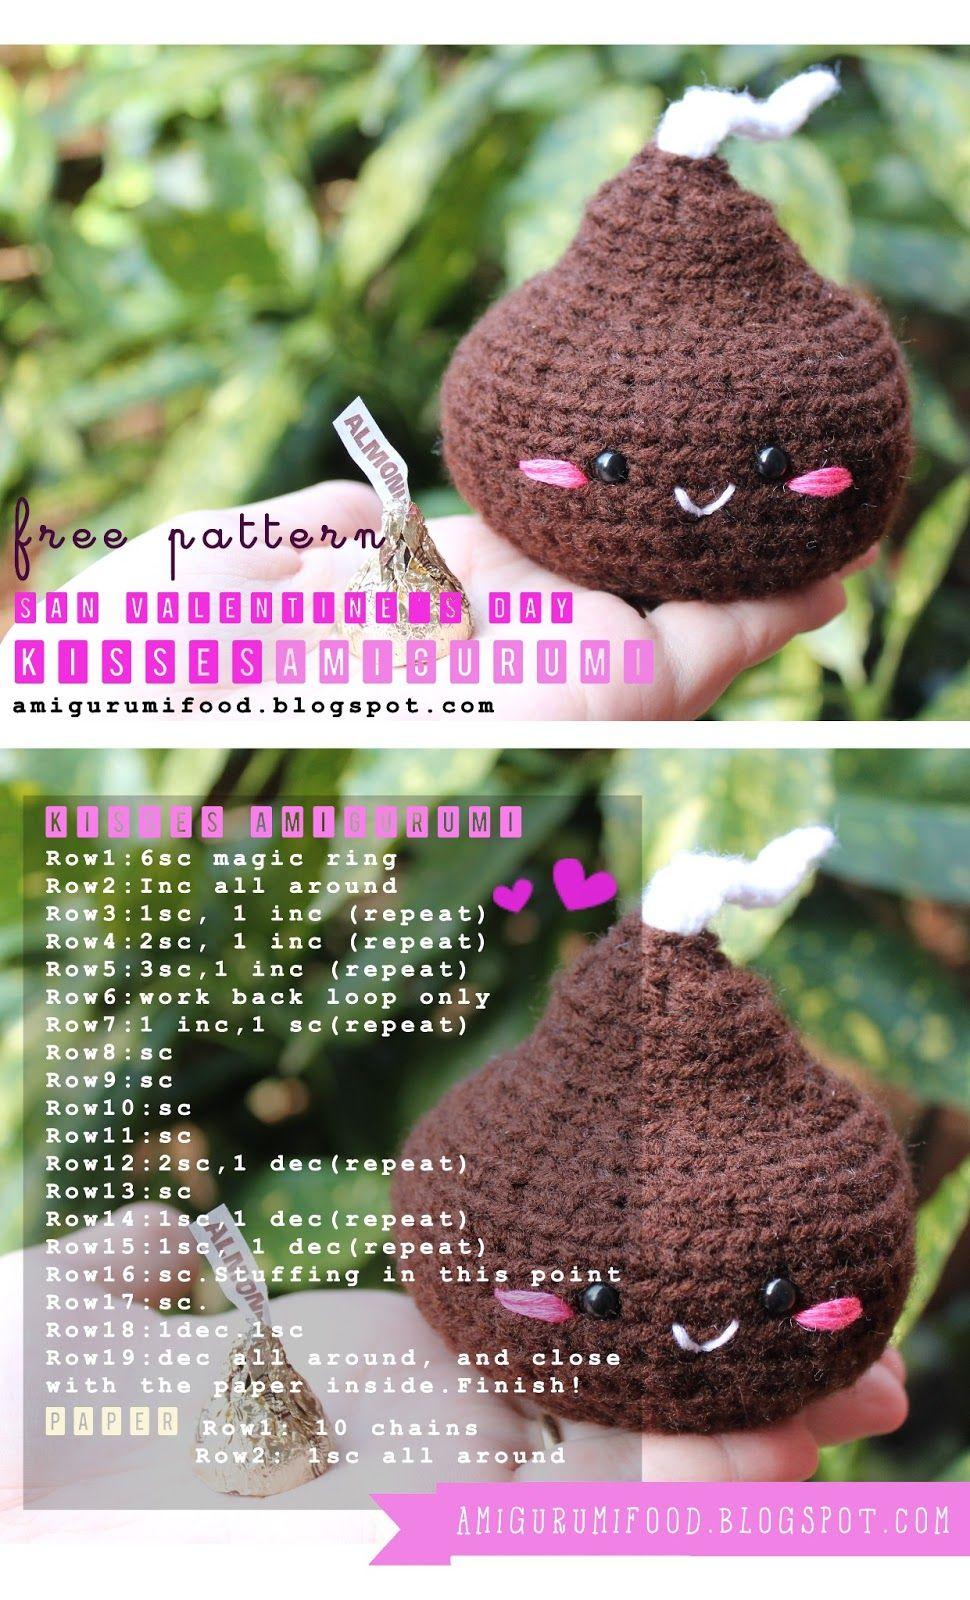 Free pattern san valentines day kisses hersheysamigurumi food free amigurumi hersheys kiss crochet pattern by amigurumi food bankloansurffo Choice Image